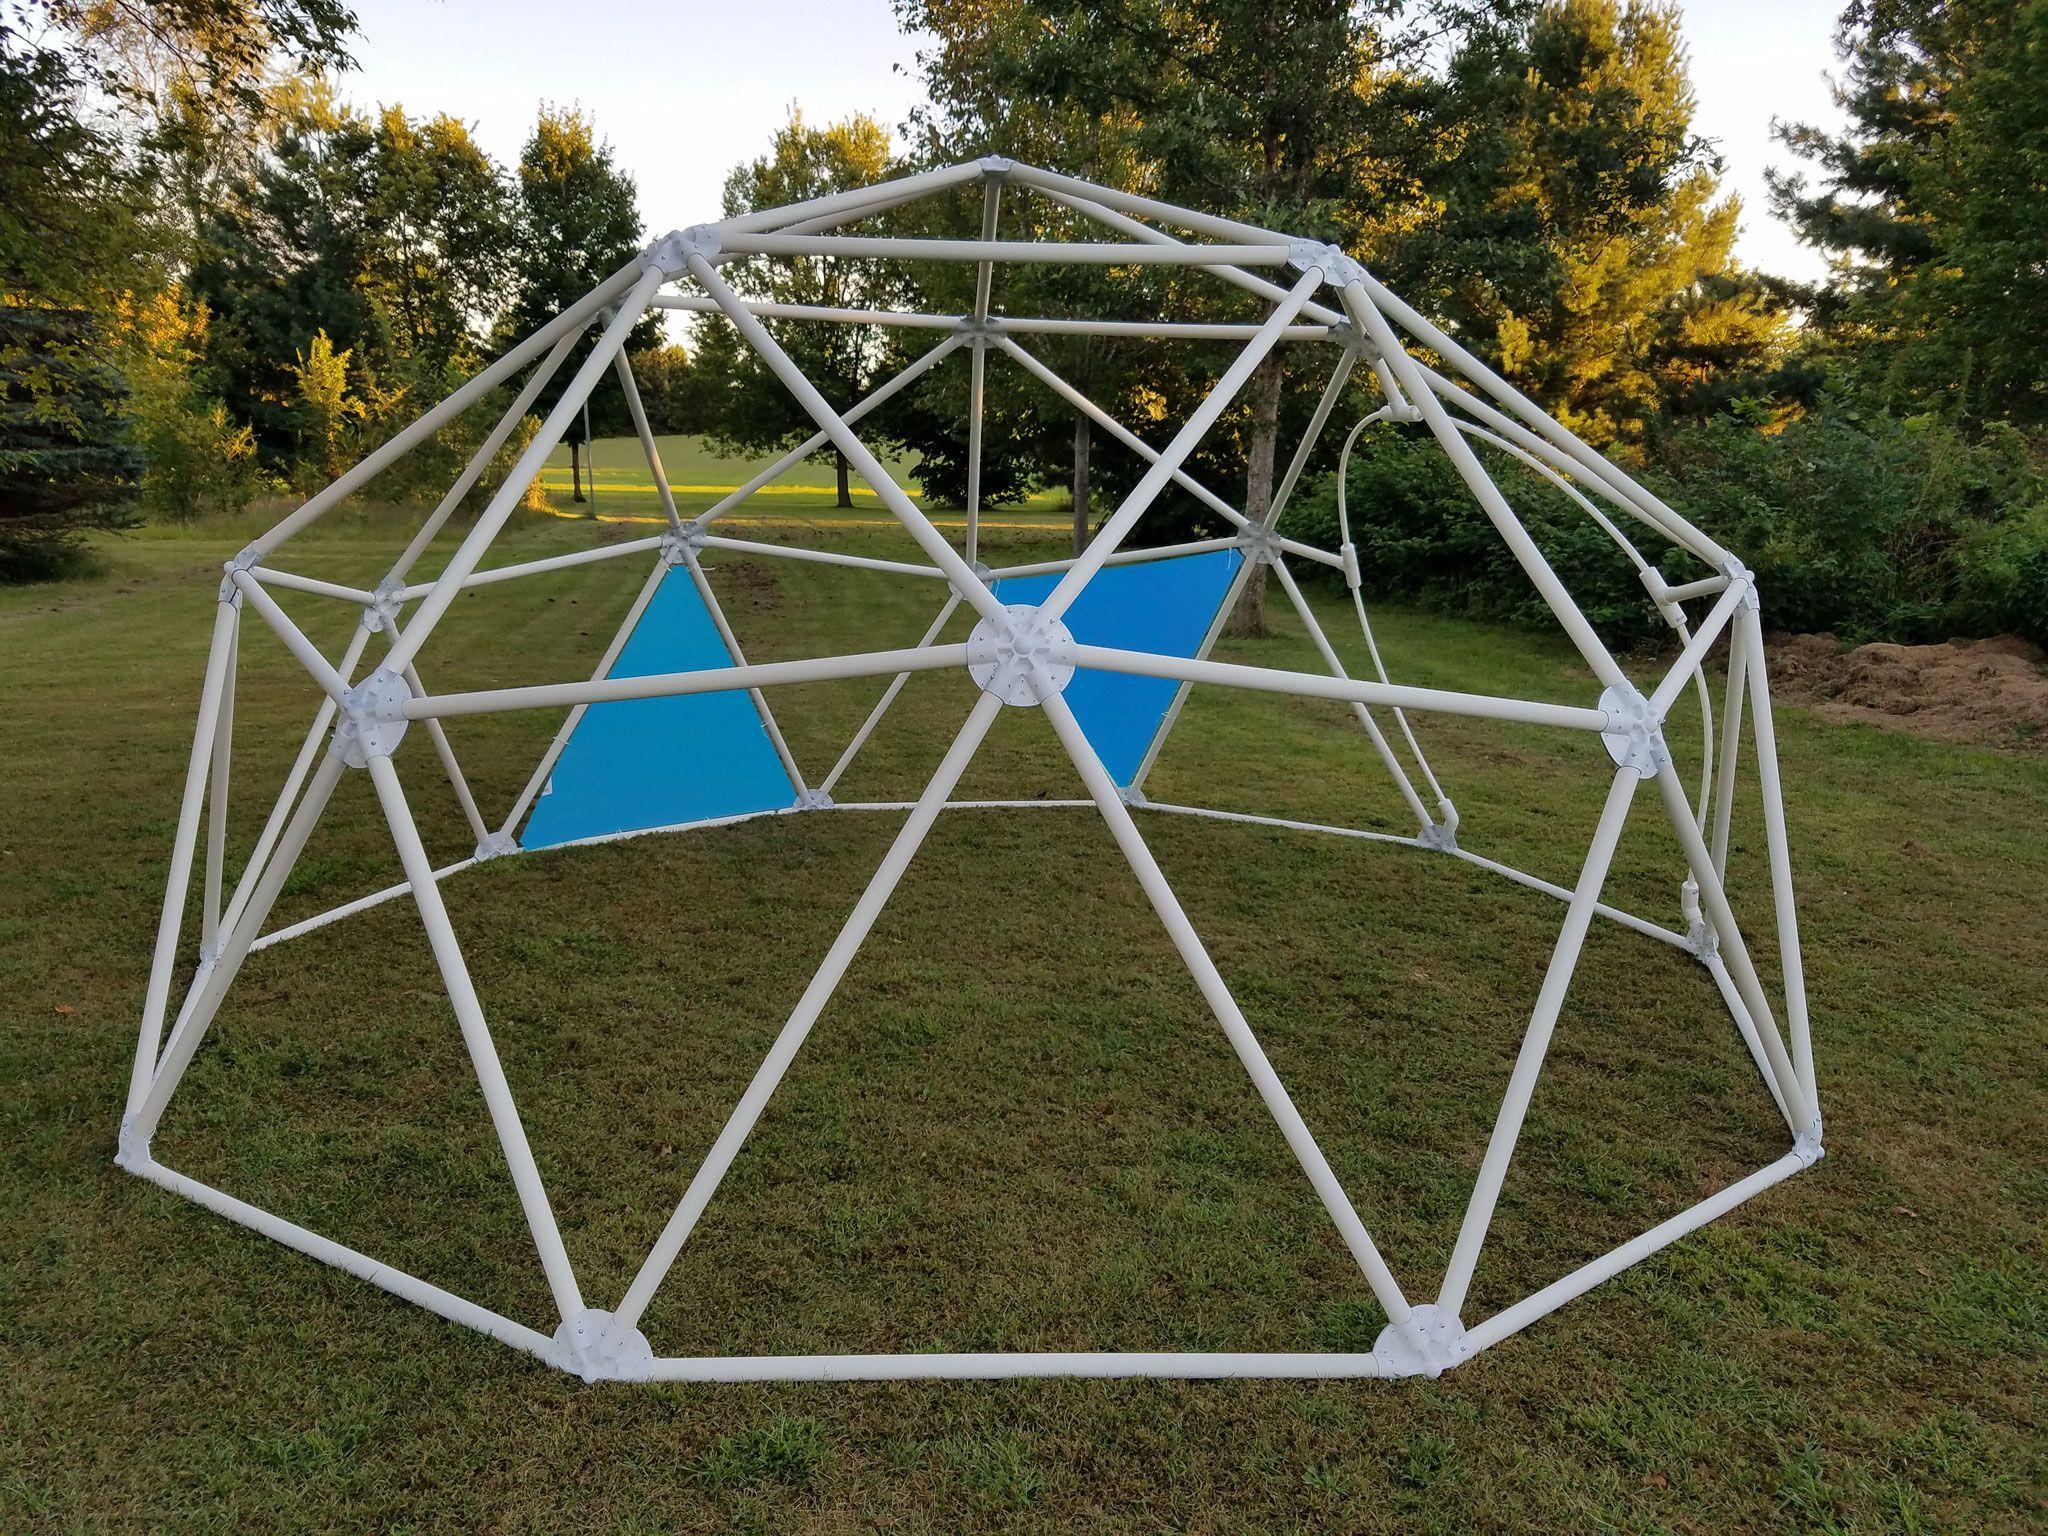 Geodesic Dome Connectors - Geodesicdomekits | Geodesic ... dedans Dome Piscine Hors Sol